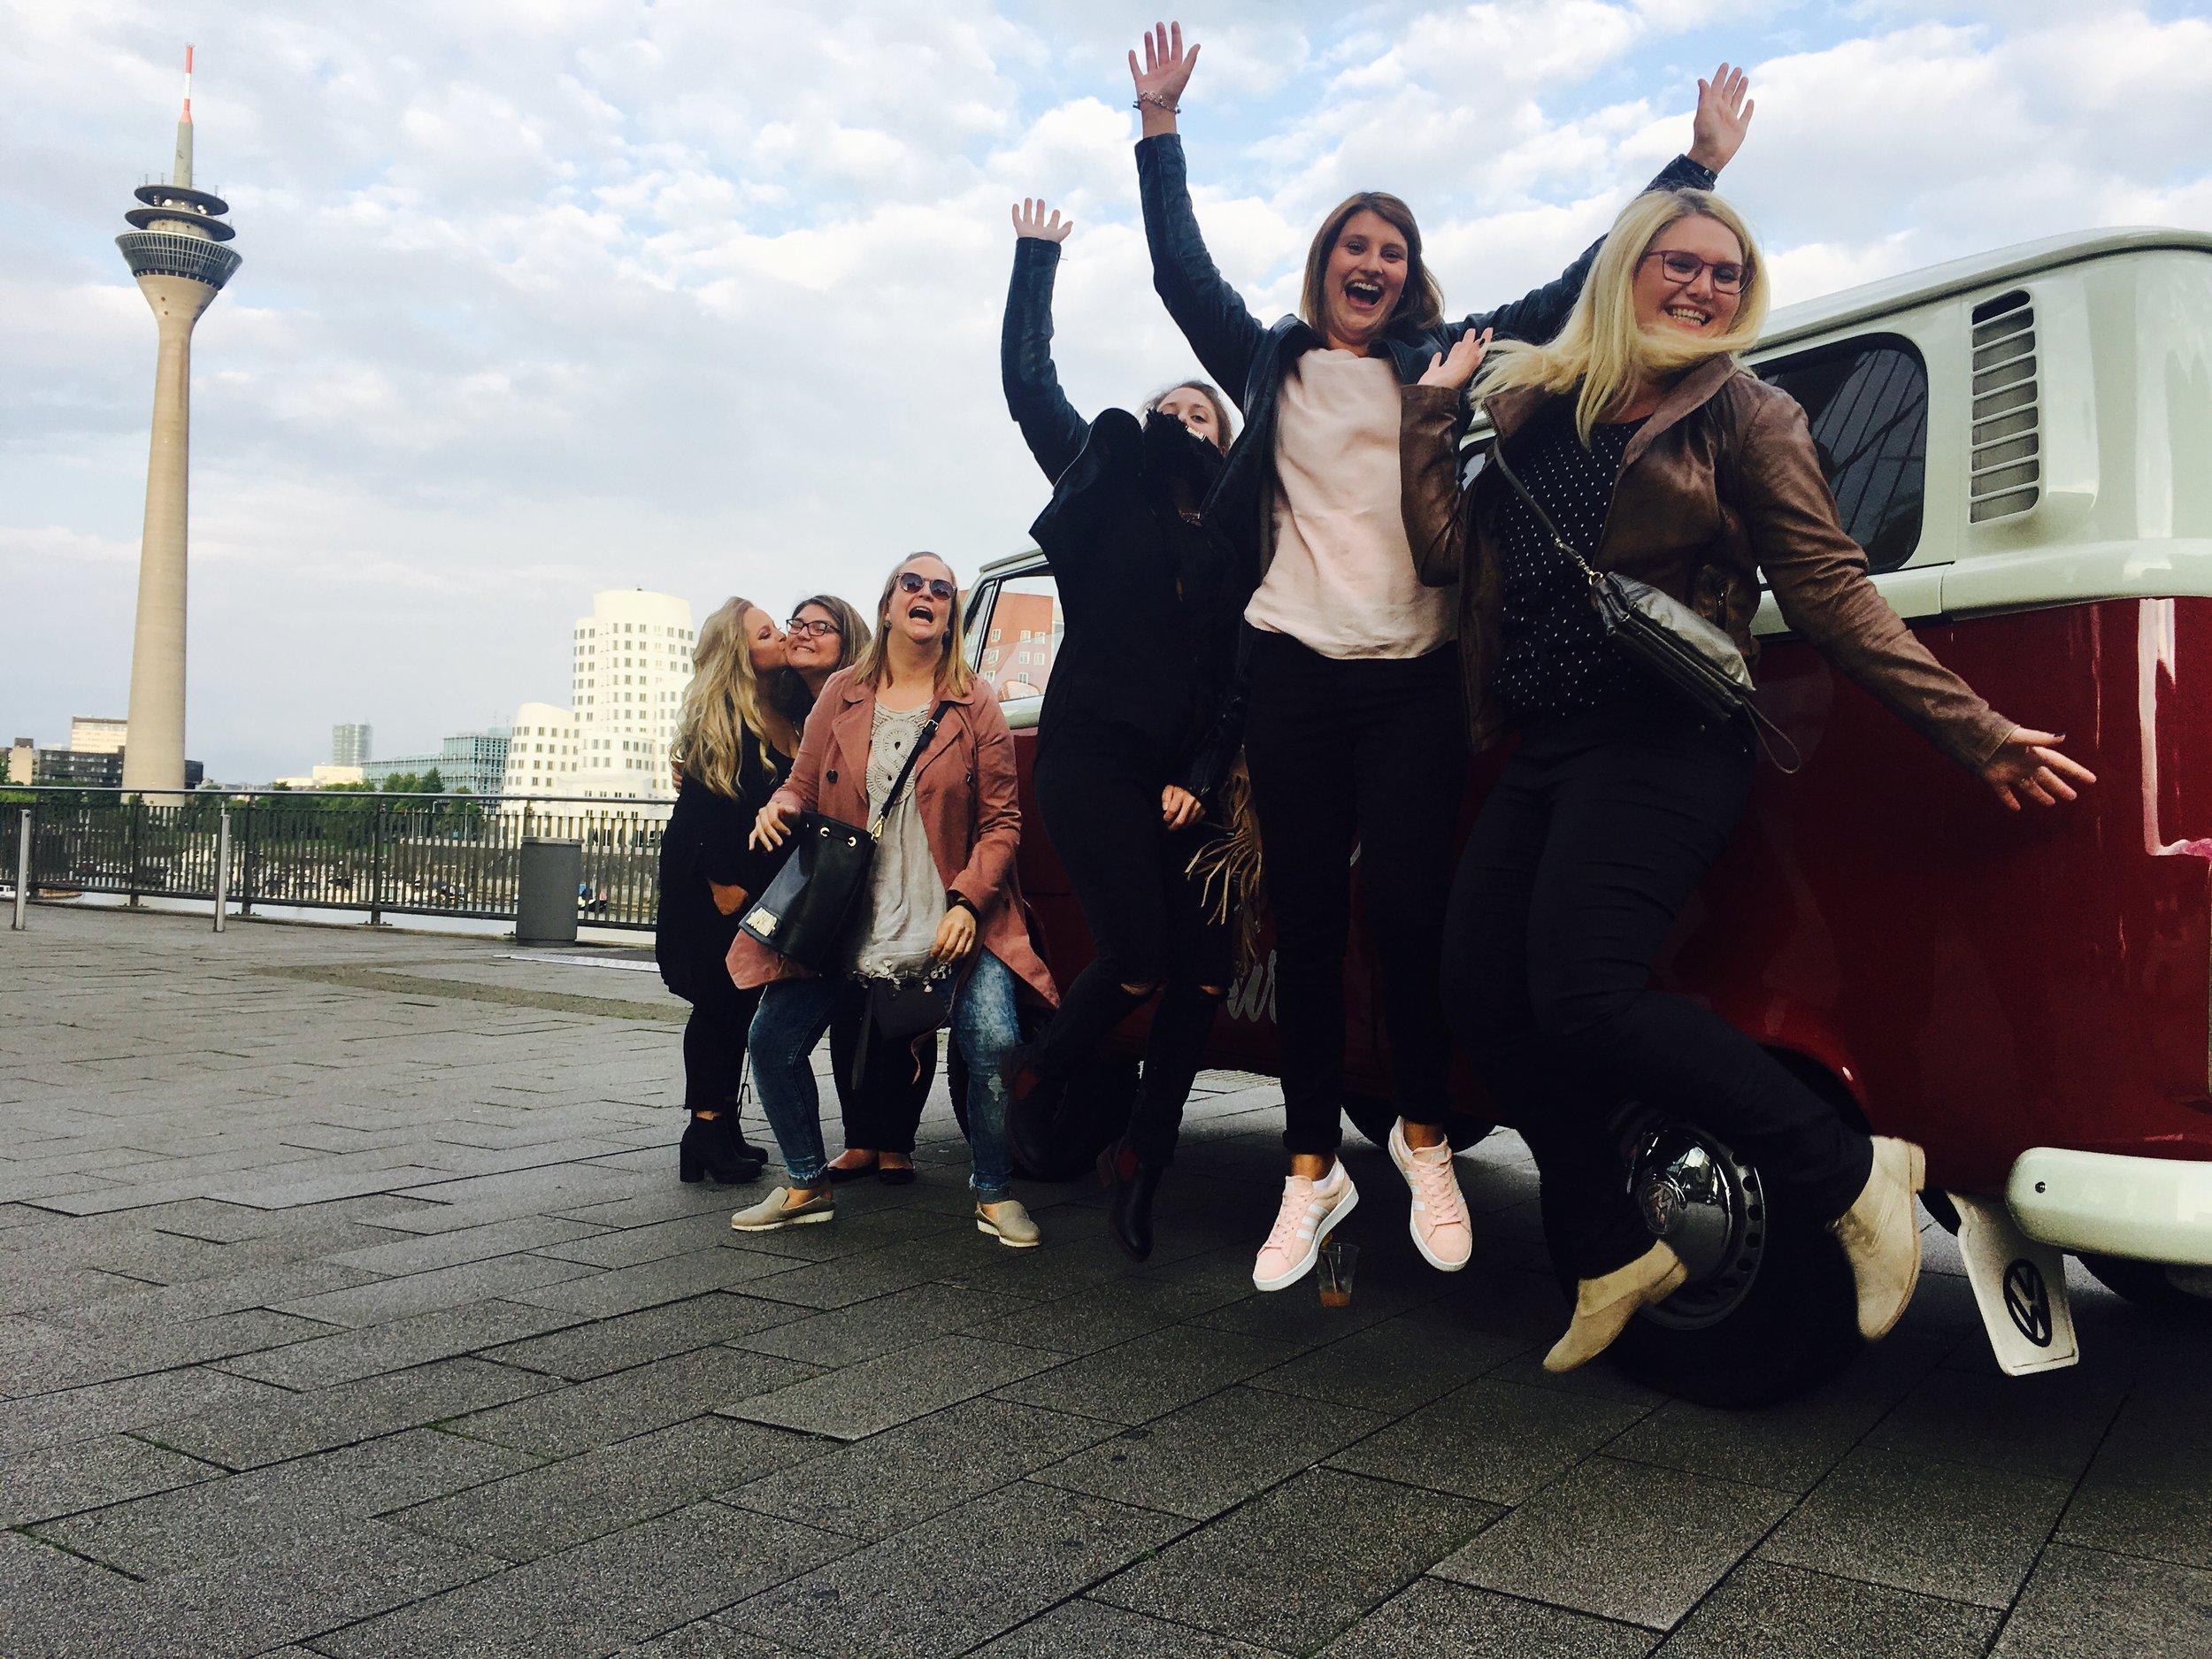 Girlstour in Düsseldorf